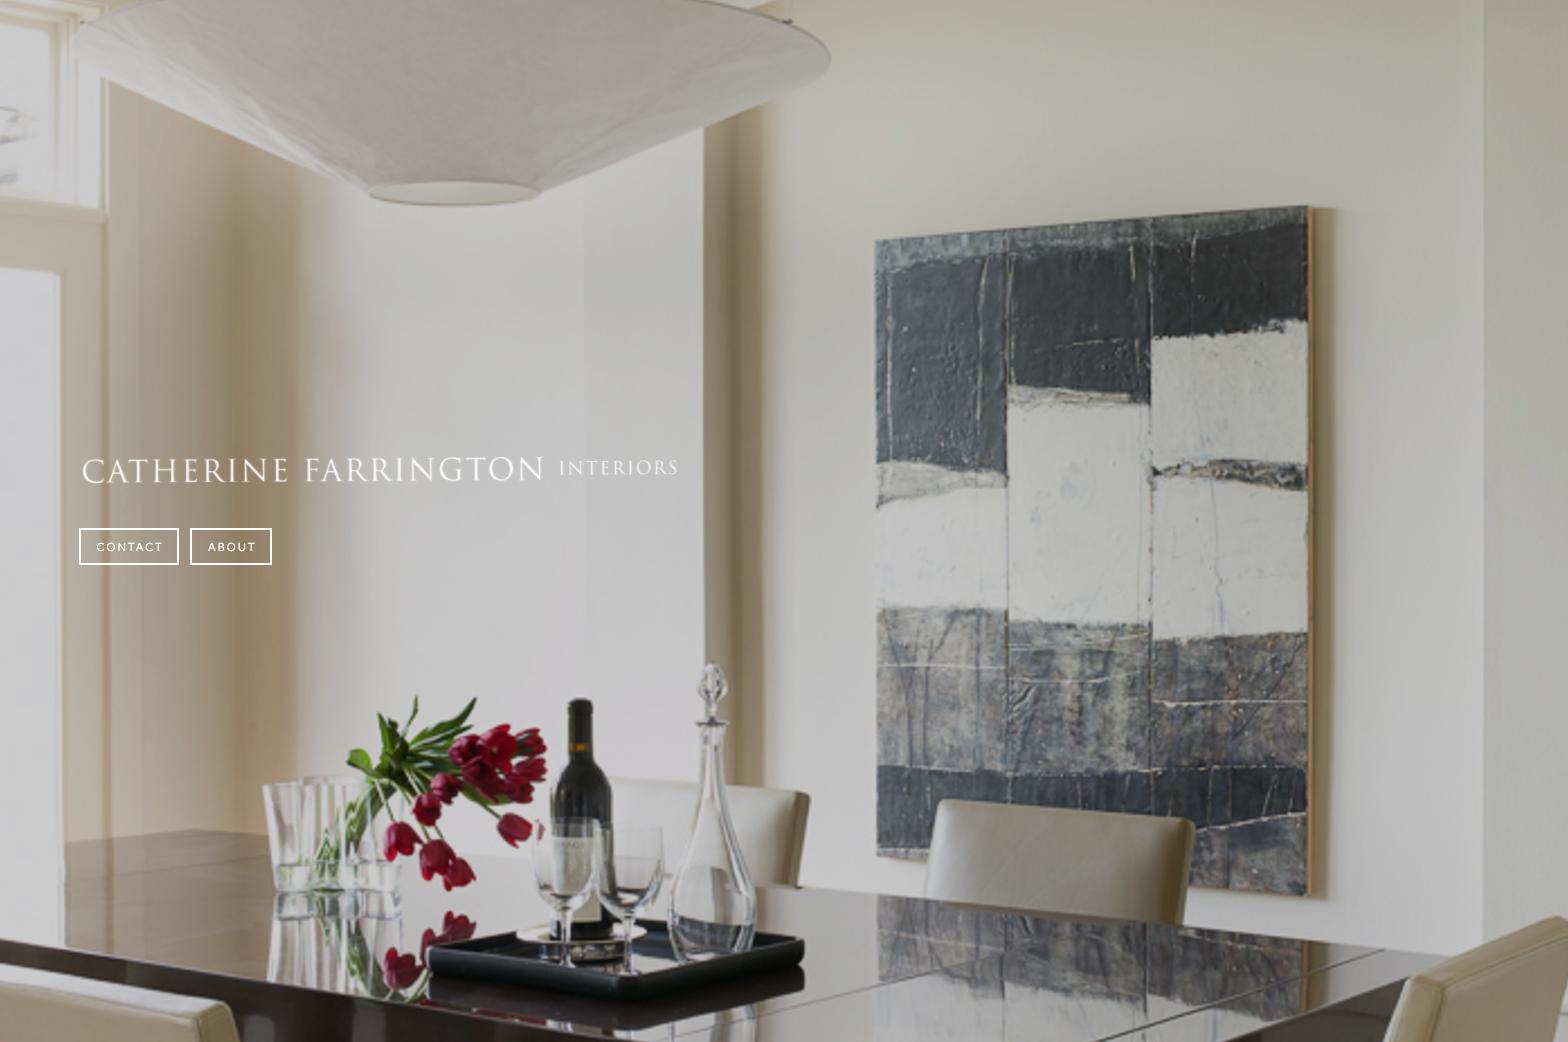 Catherine Farrington Interiors | Website